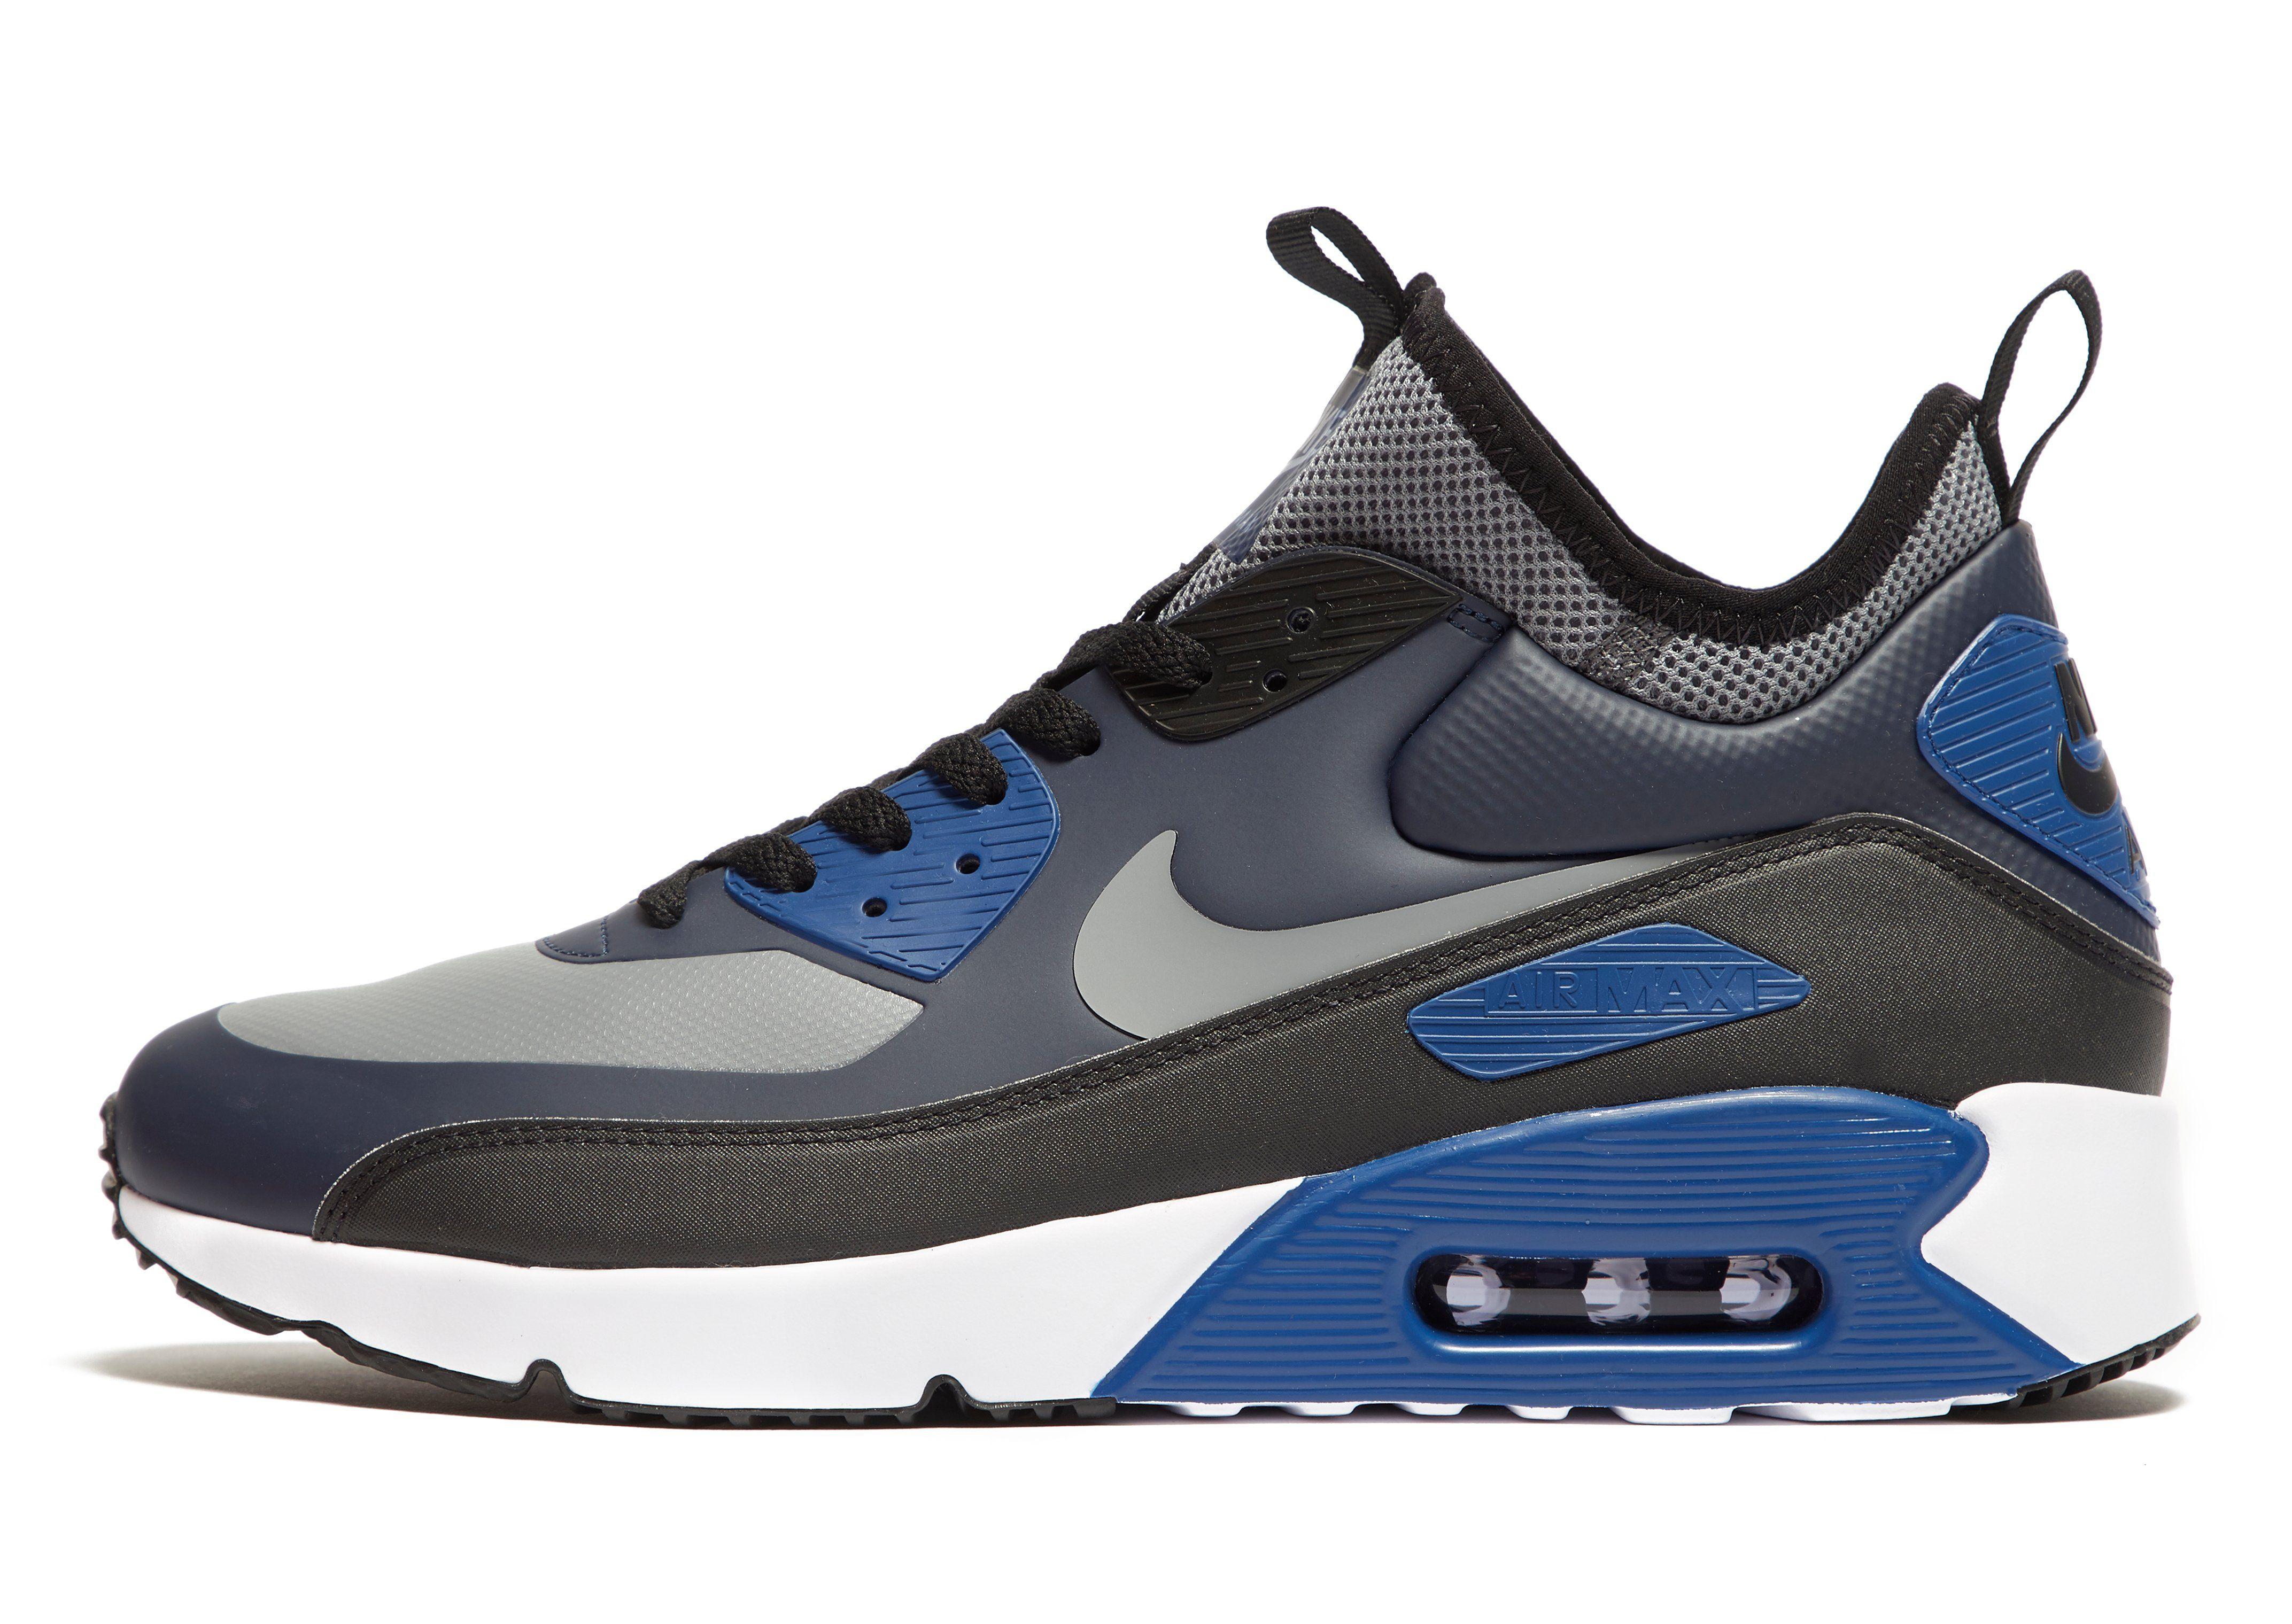 nike air max 90 blue grey and black